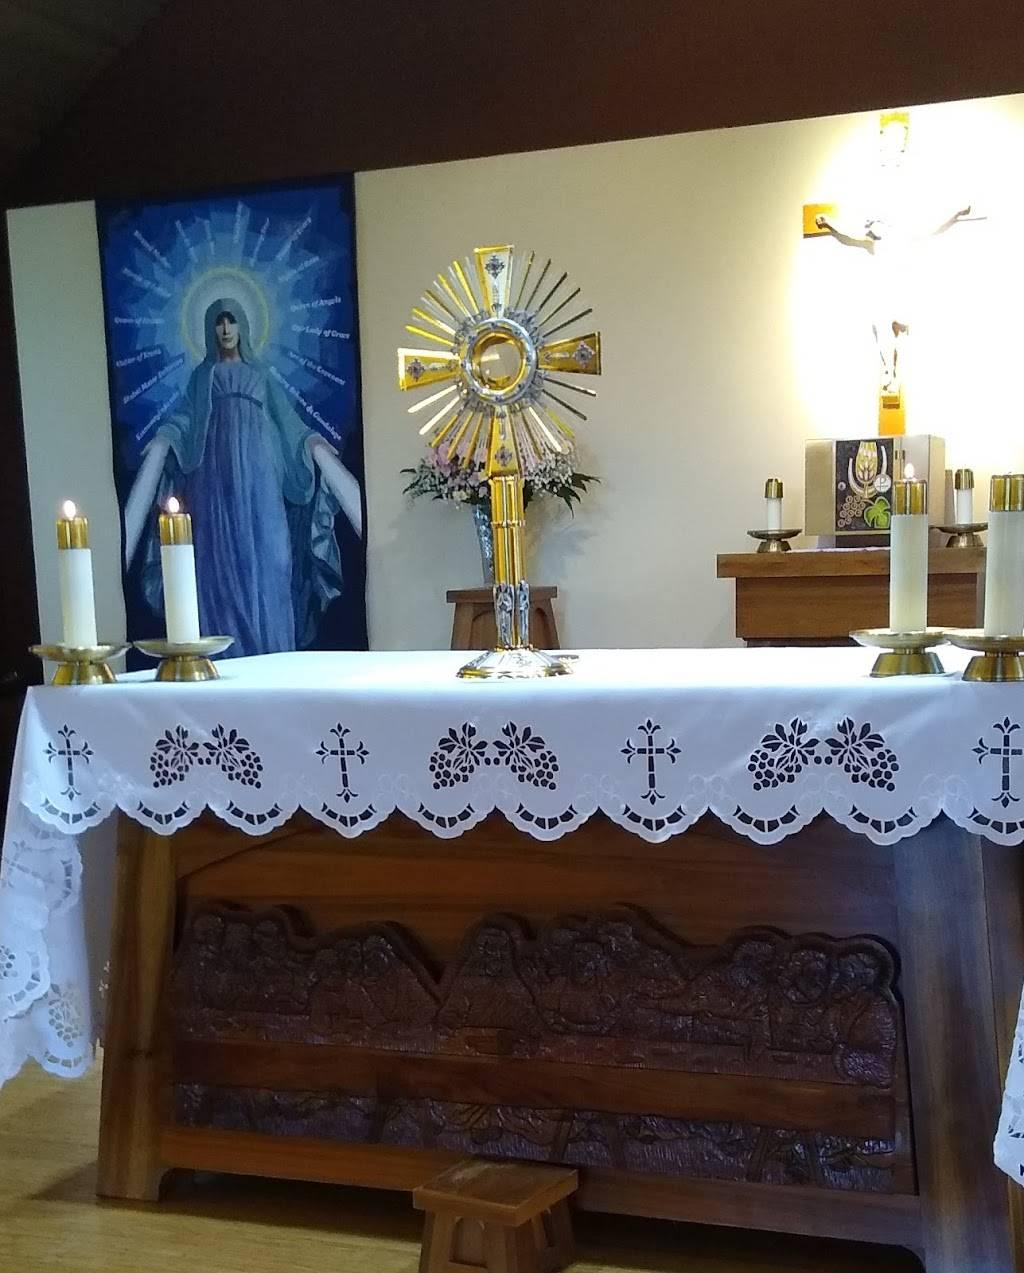 St Philip Benizi Church - church  | Photo 1 of 2 | Address: 18211 S Henrici Rd, Oregon City, OR 97045, USA | Phone: (503) 631-2882